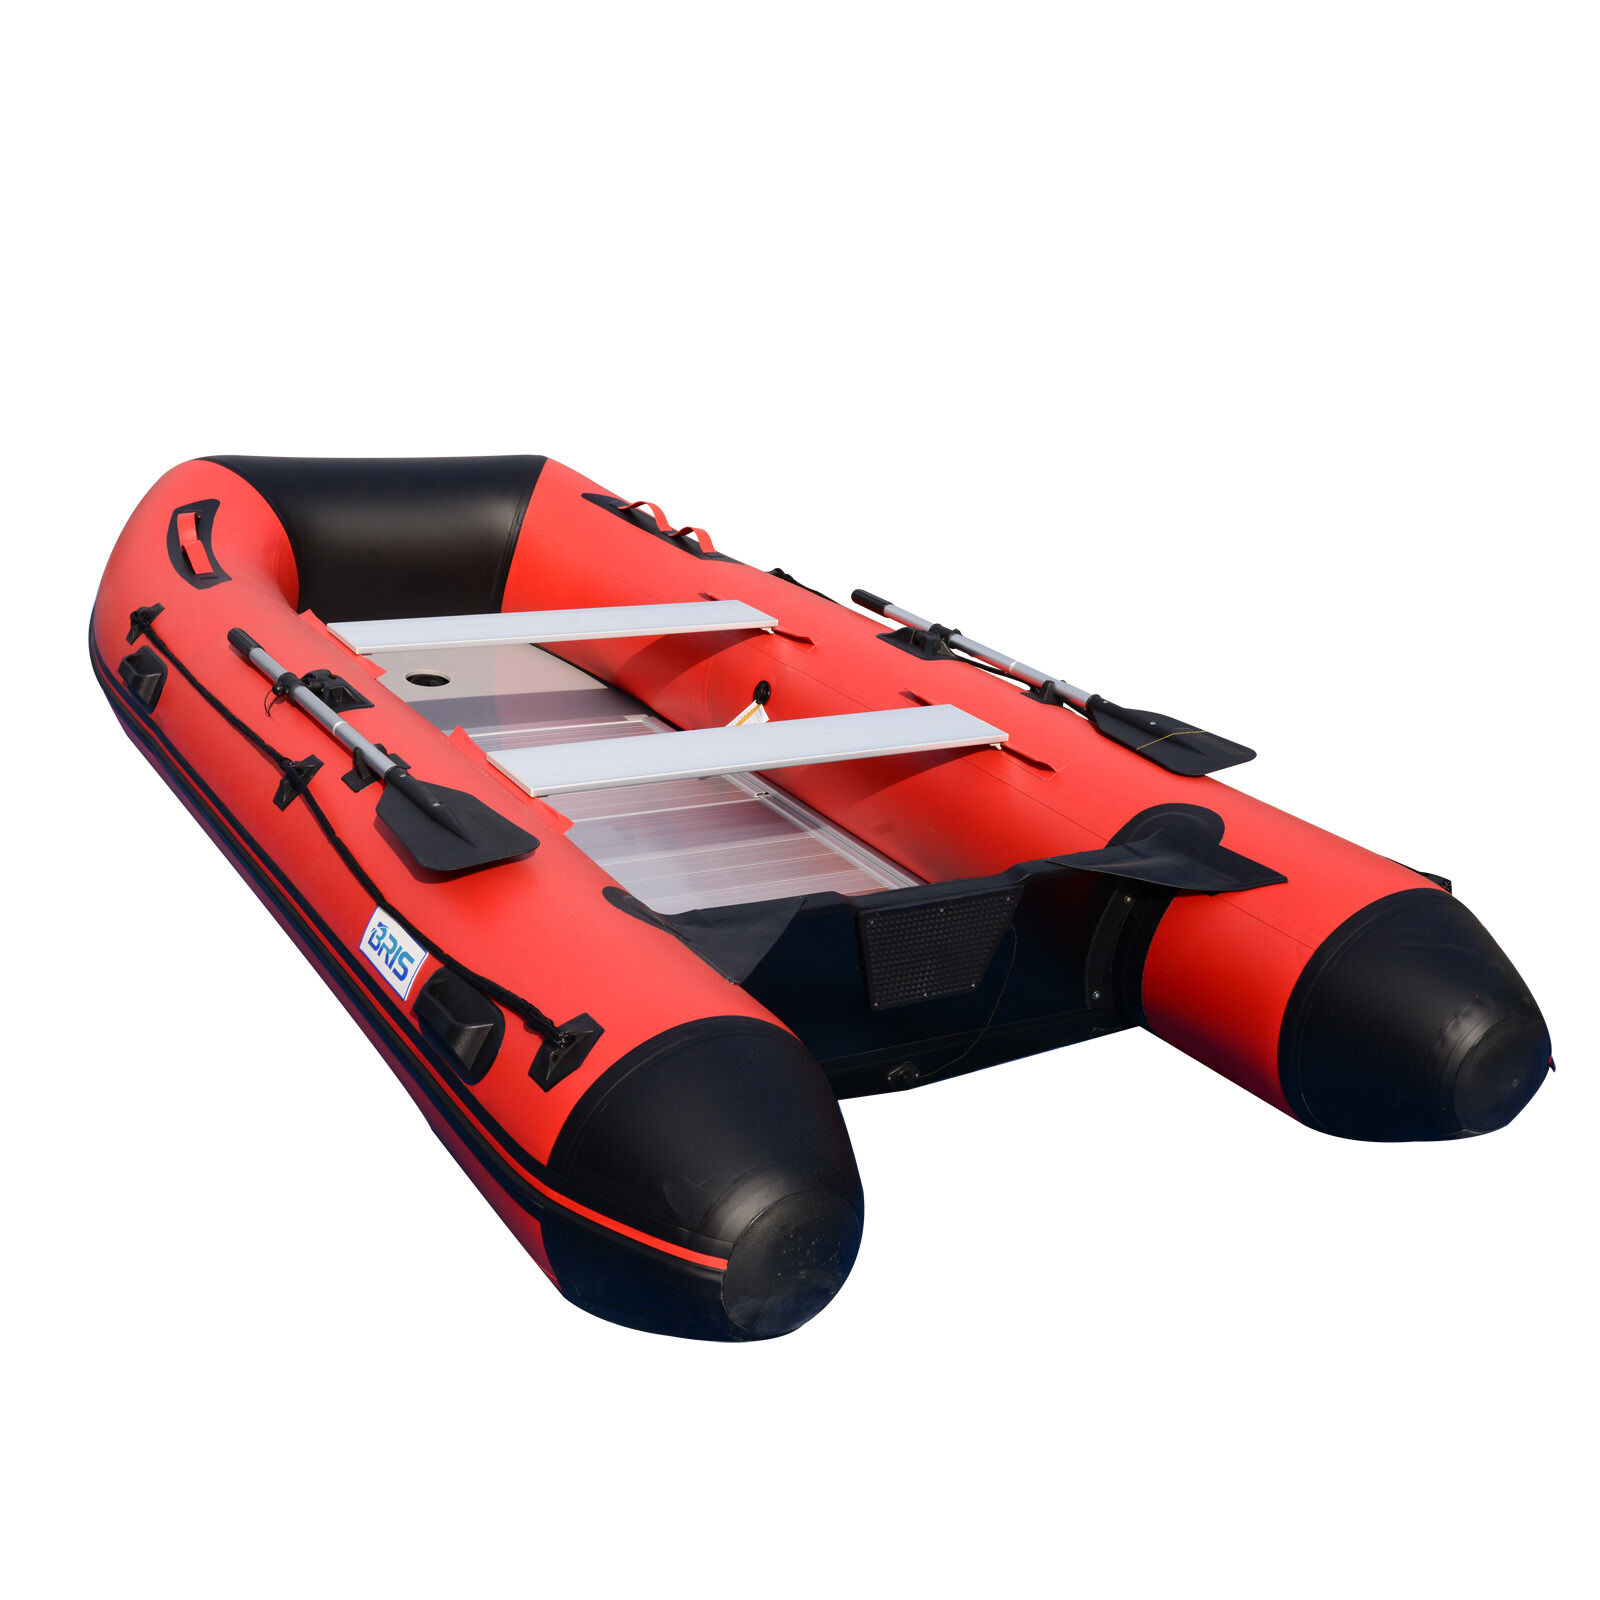 BRIS 12ft Inflatable Boat Dinghy Raft Pontoon Rescue & Dive